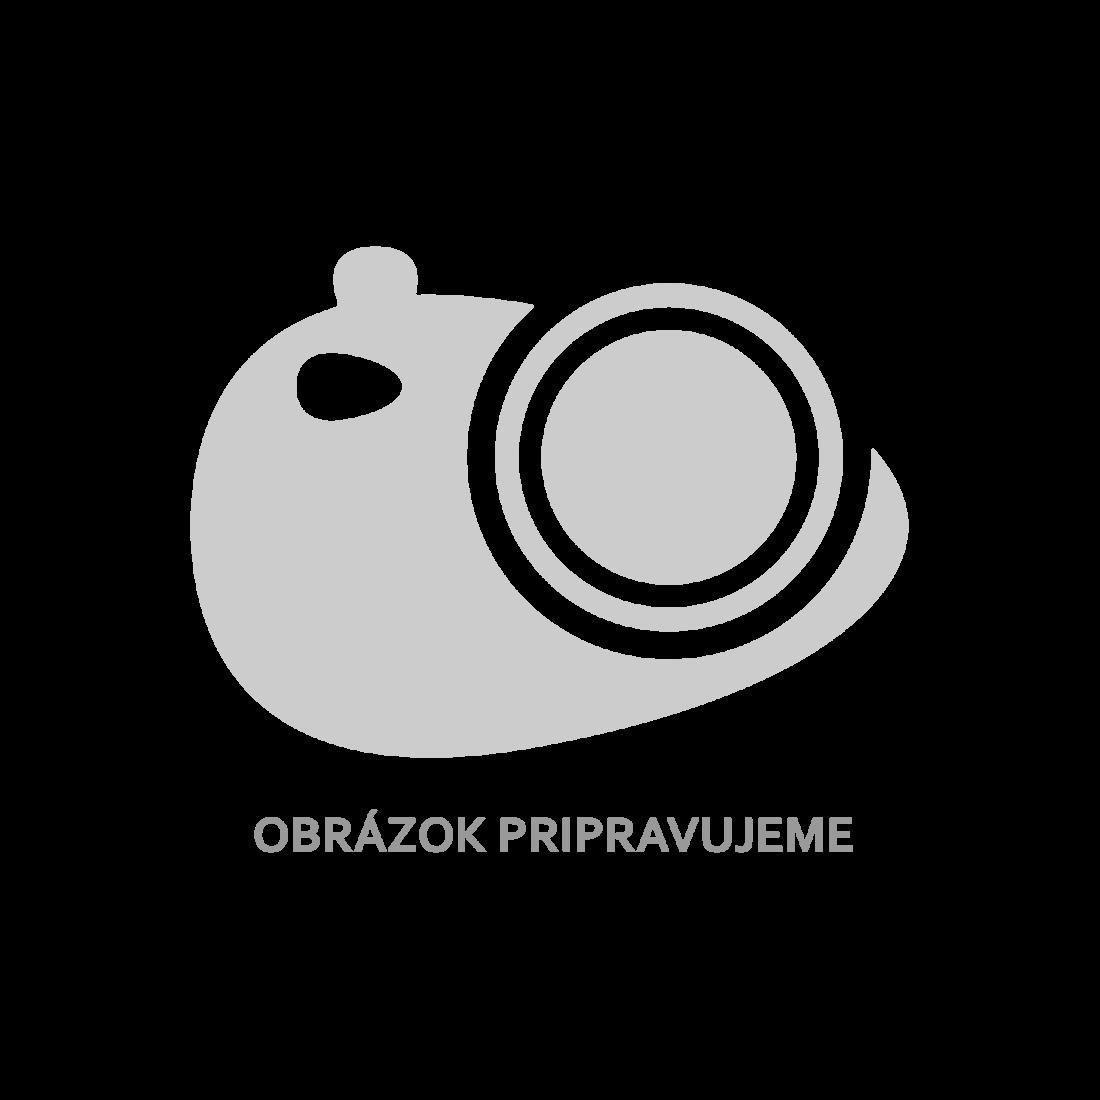 vidaXL Skládací zahradní stůl bílý 45 x 43 x 50 cm plast [48808]